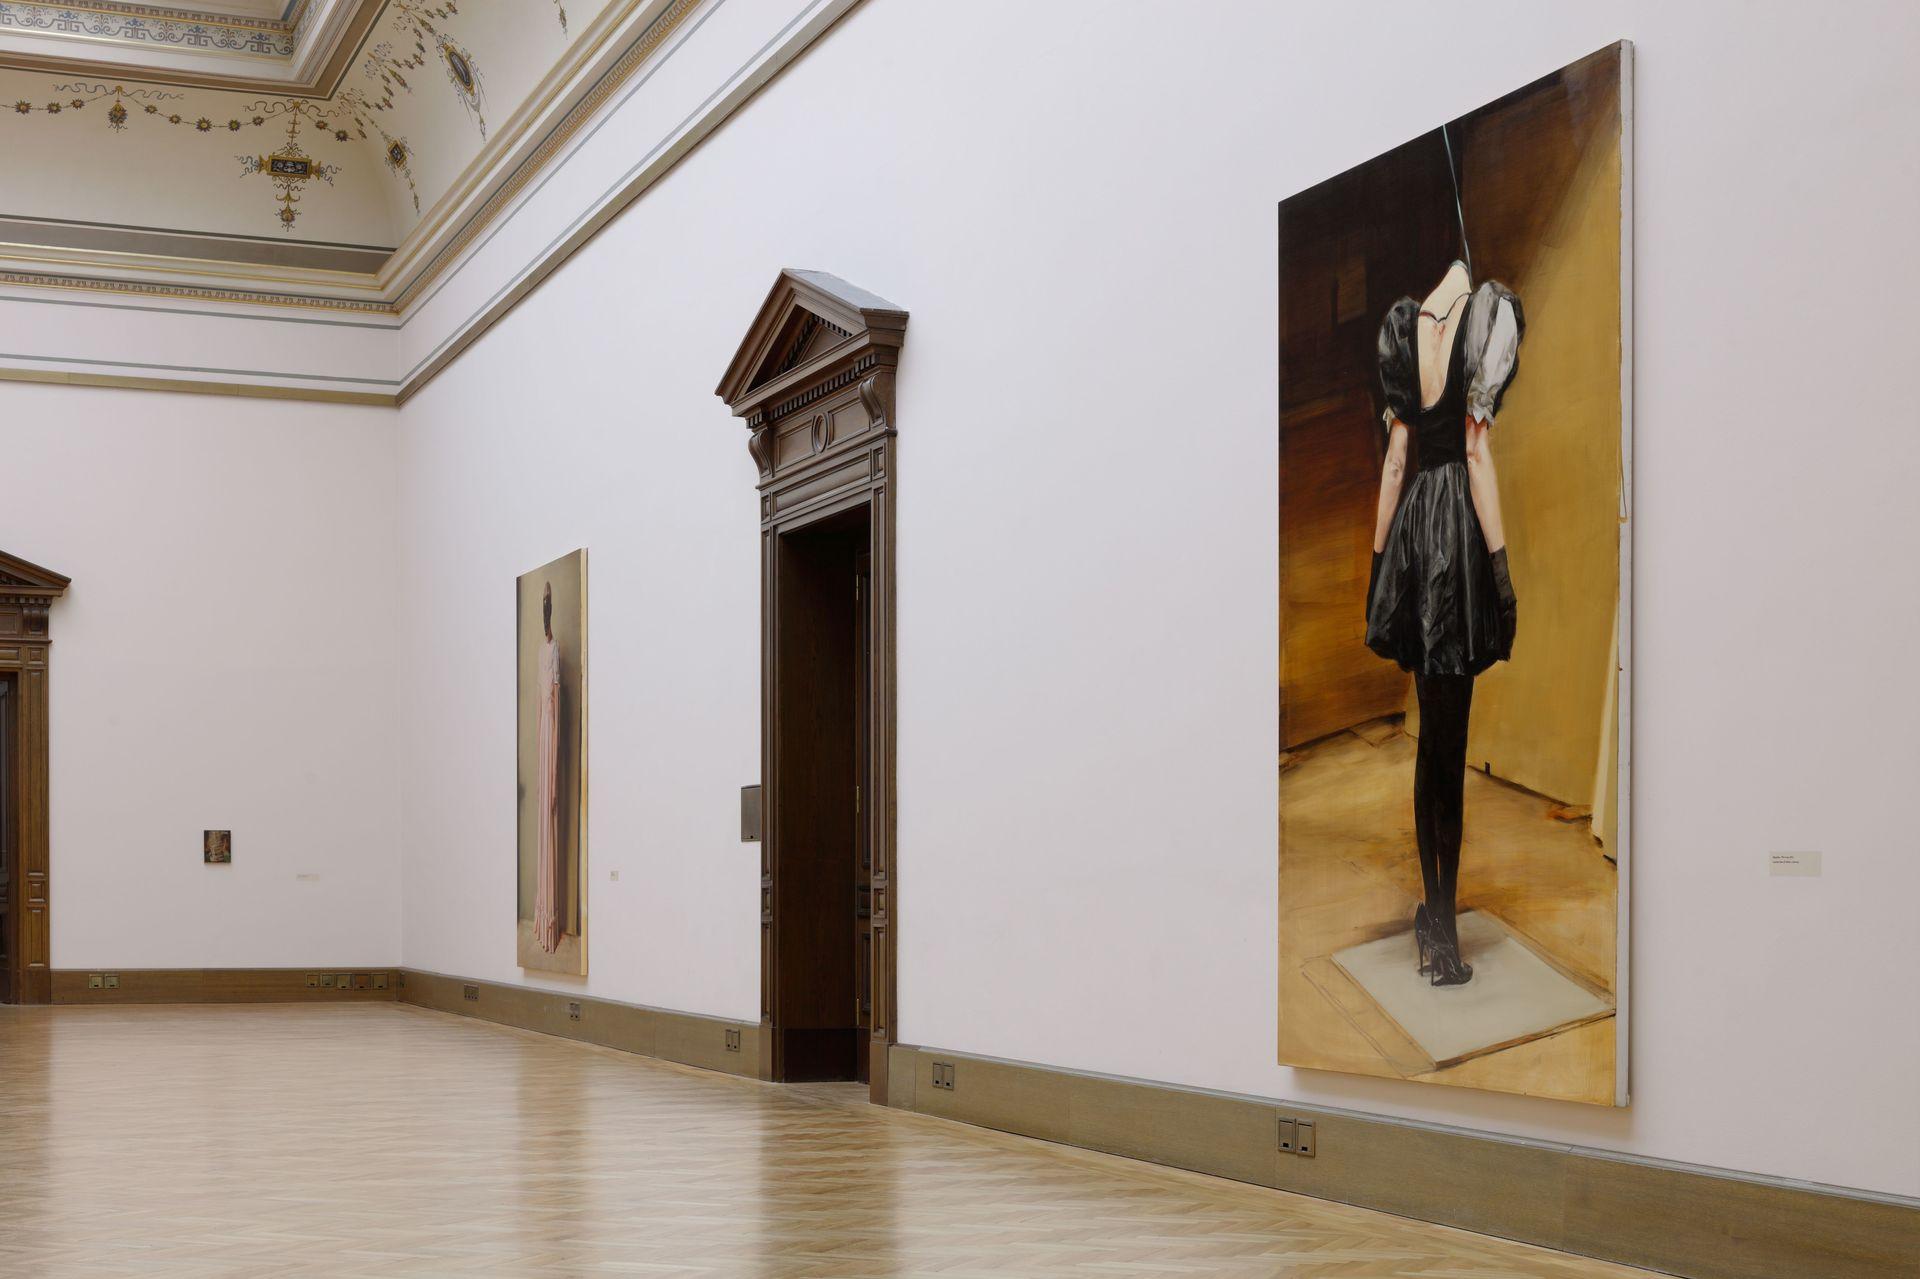 Michaël Borremans The Duck, pohled do výstavy (c) Galerie Rudolfinum. Foto Martin Polák (8).jpg